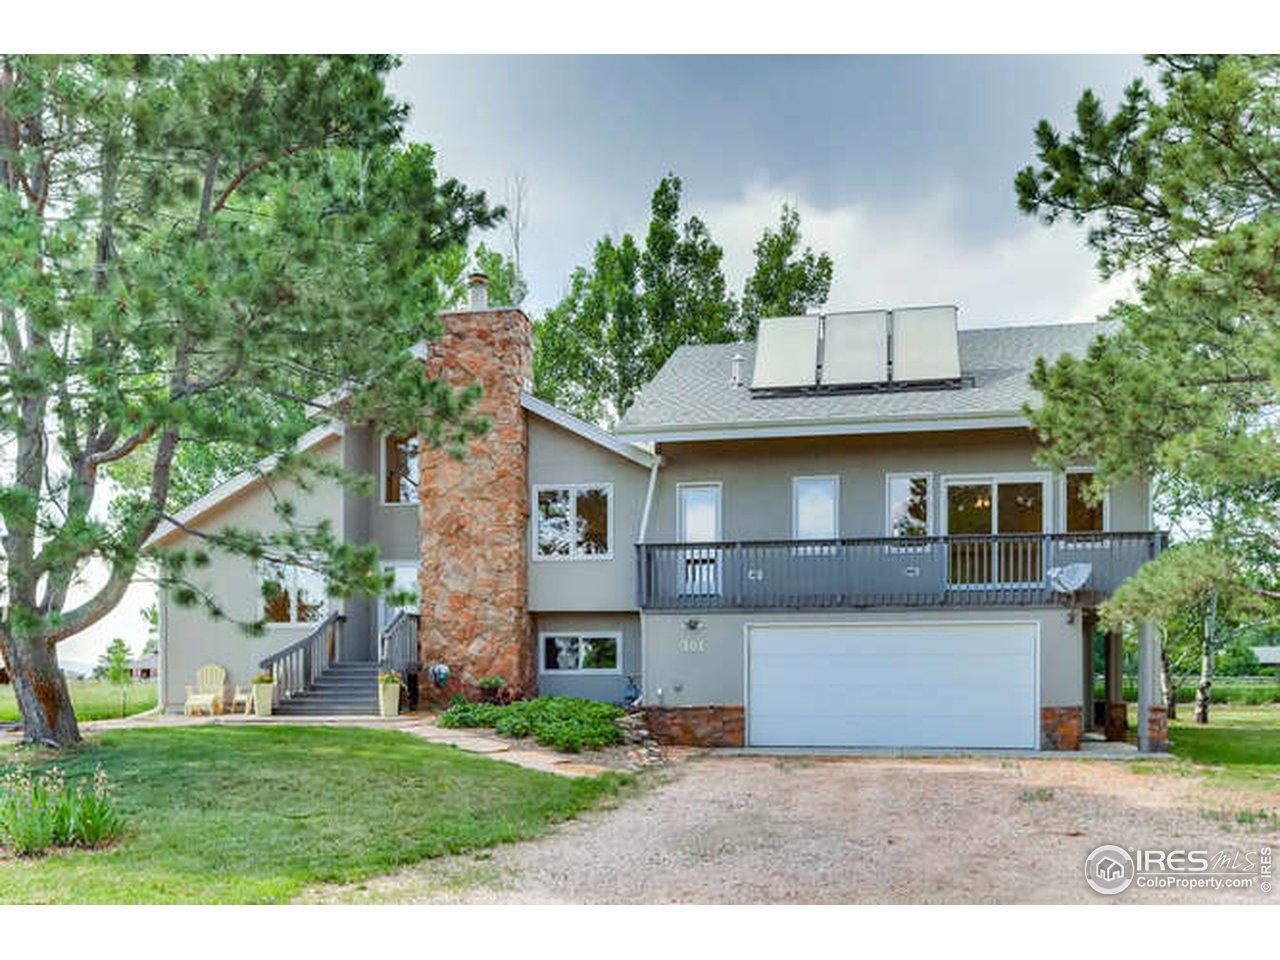 301 Ridgewood Ct, Fort Collins CO 80524